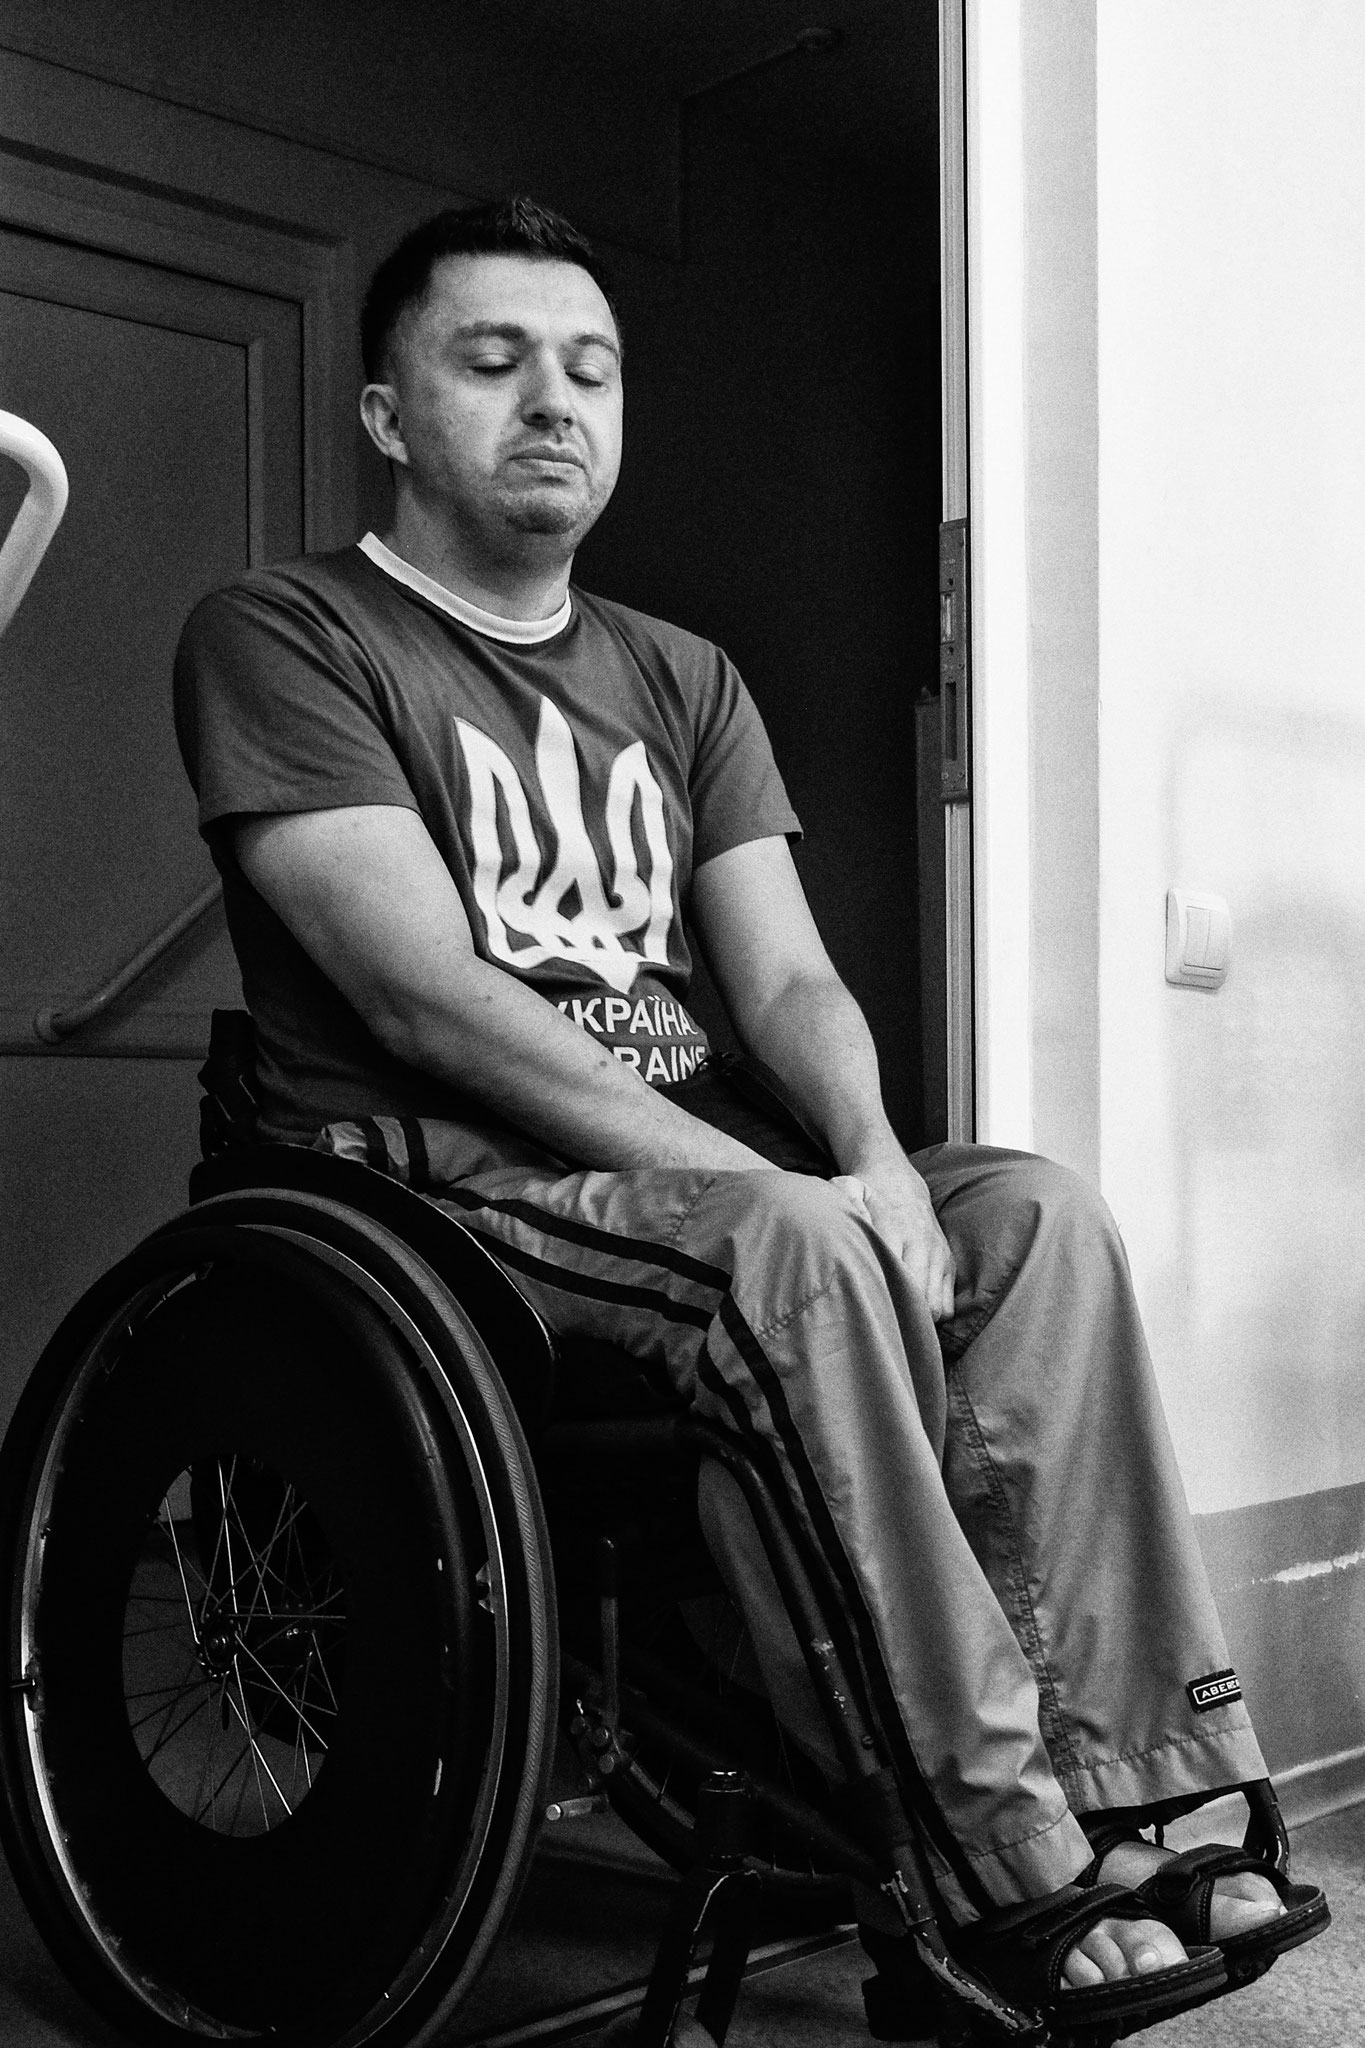 Rehabilitaion clinic, Kramatorsk 2019